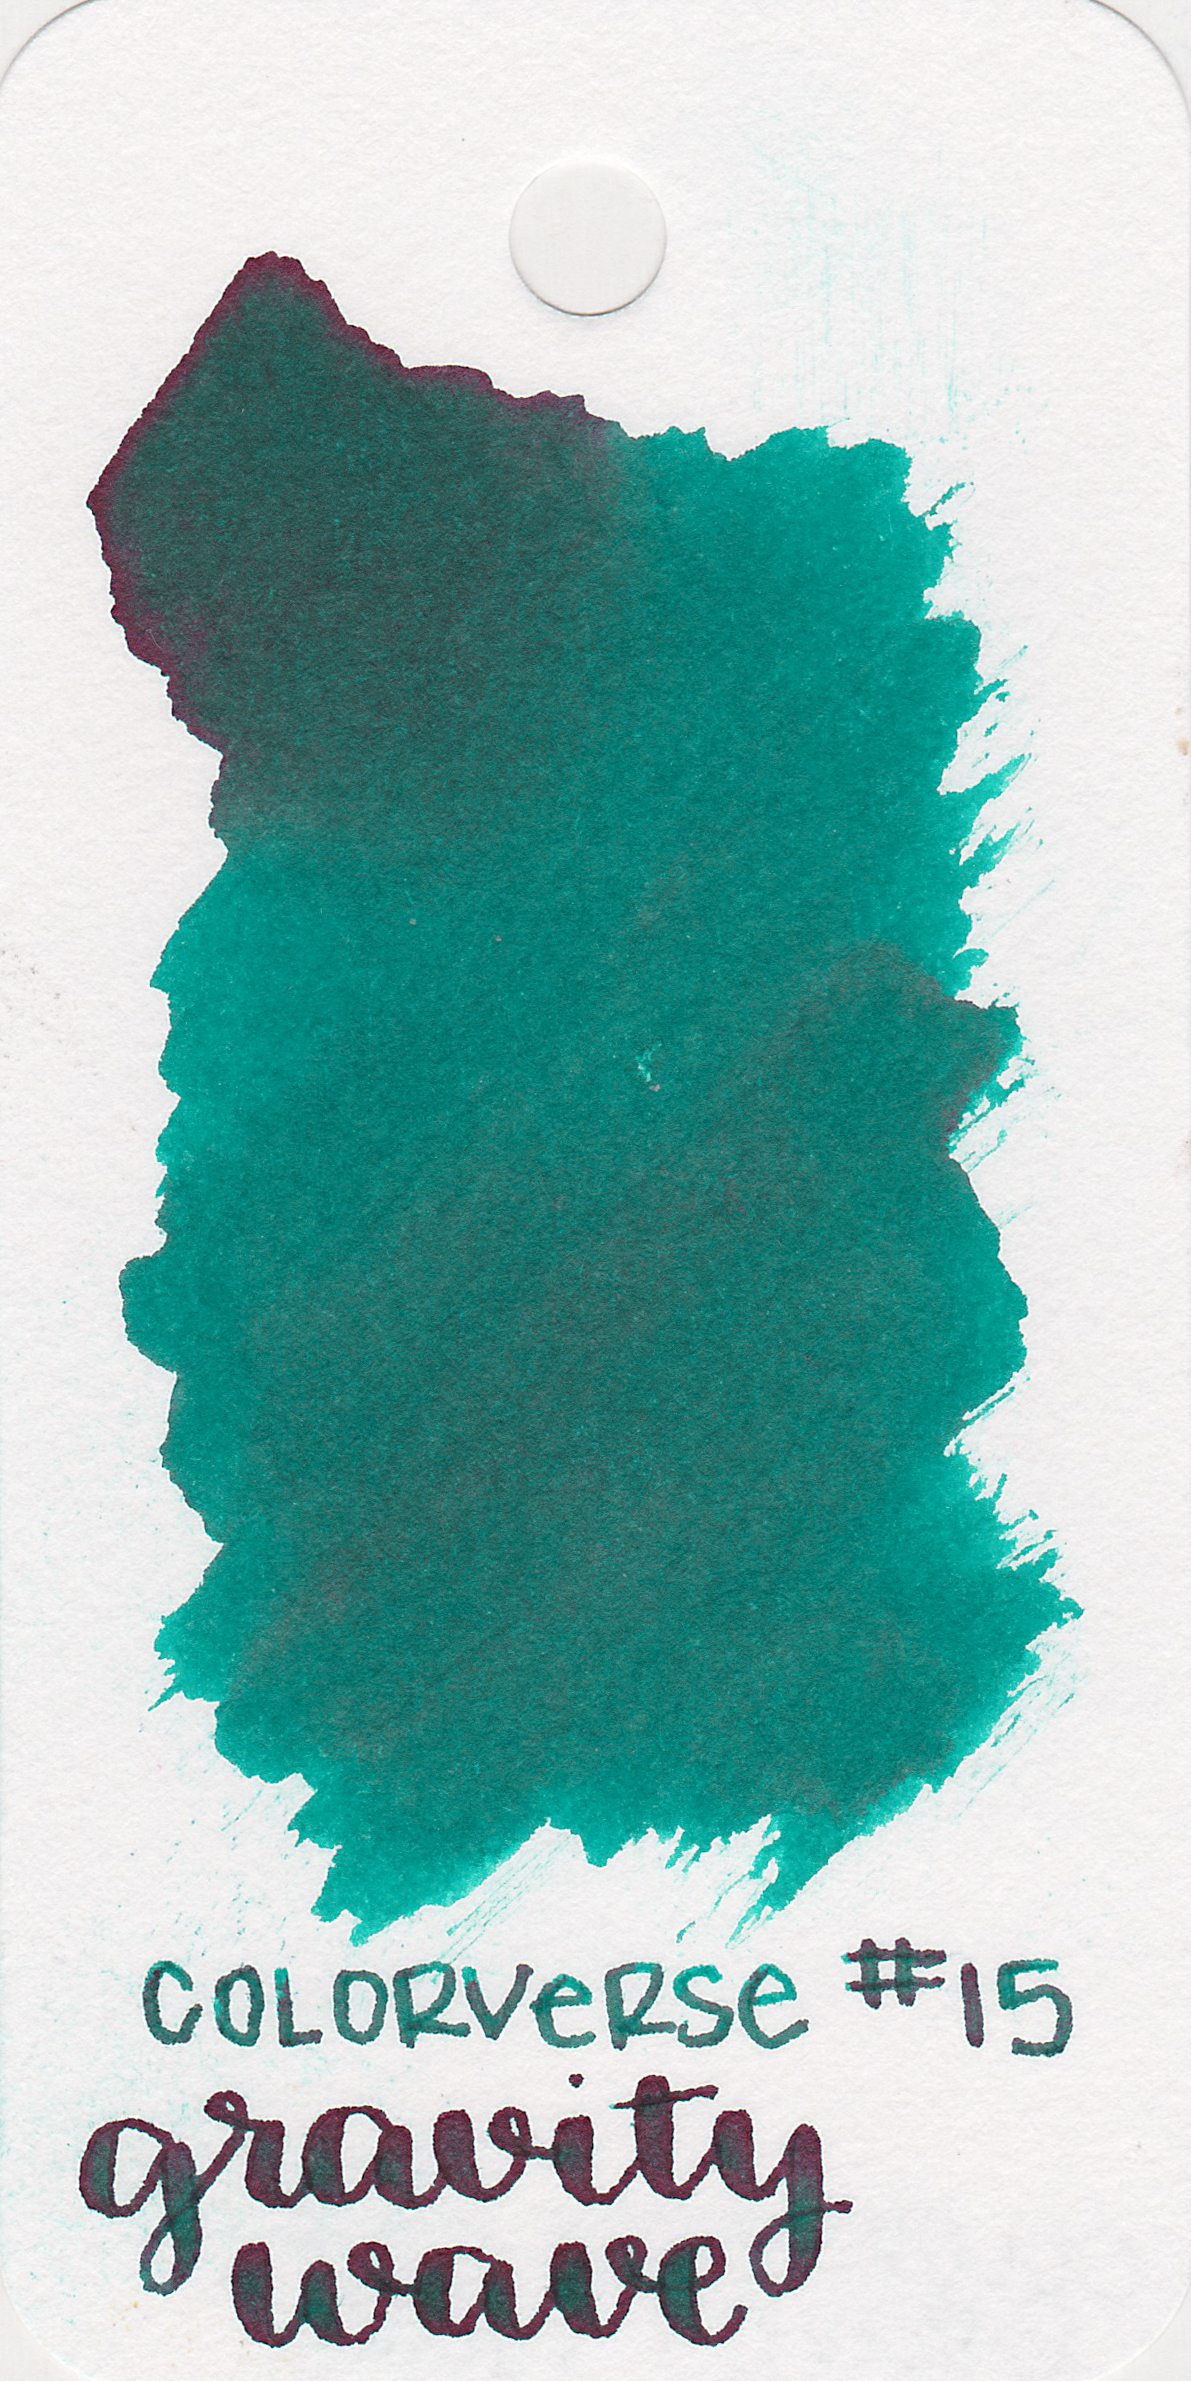 cv-gravity-wave-1.jpg